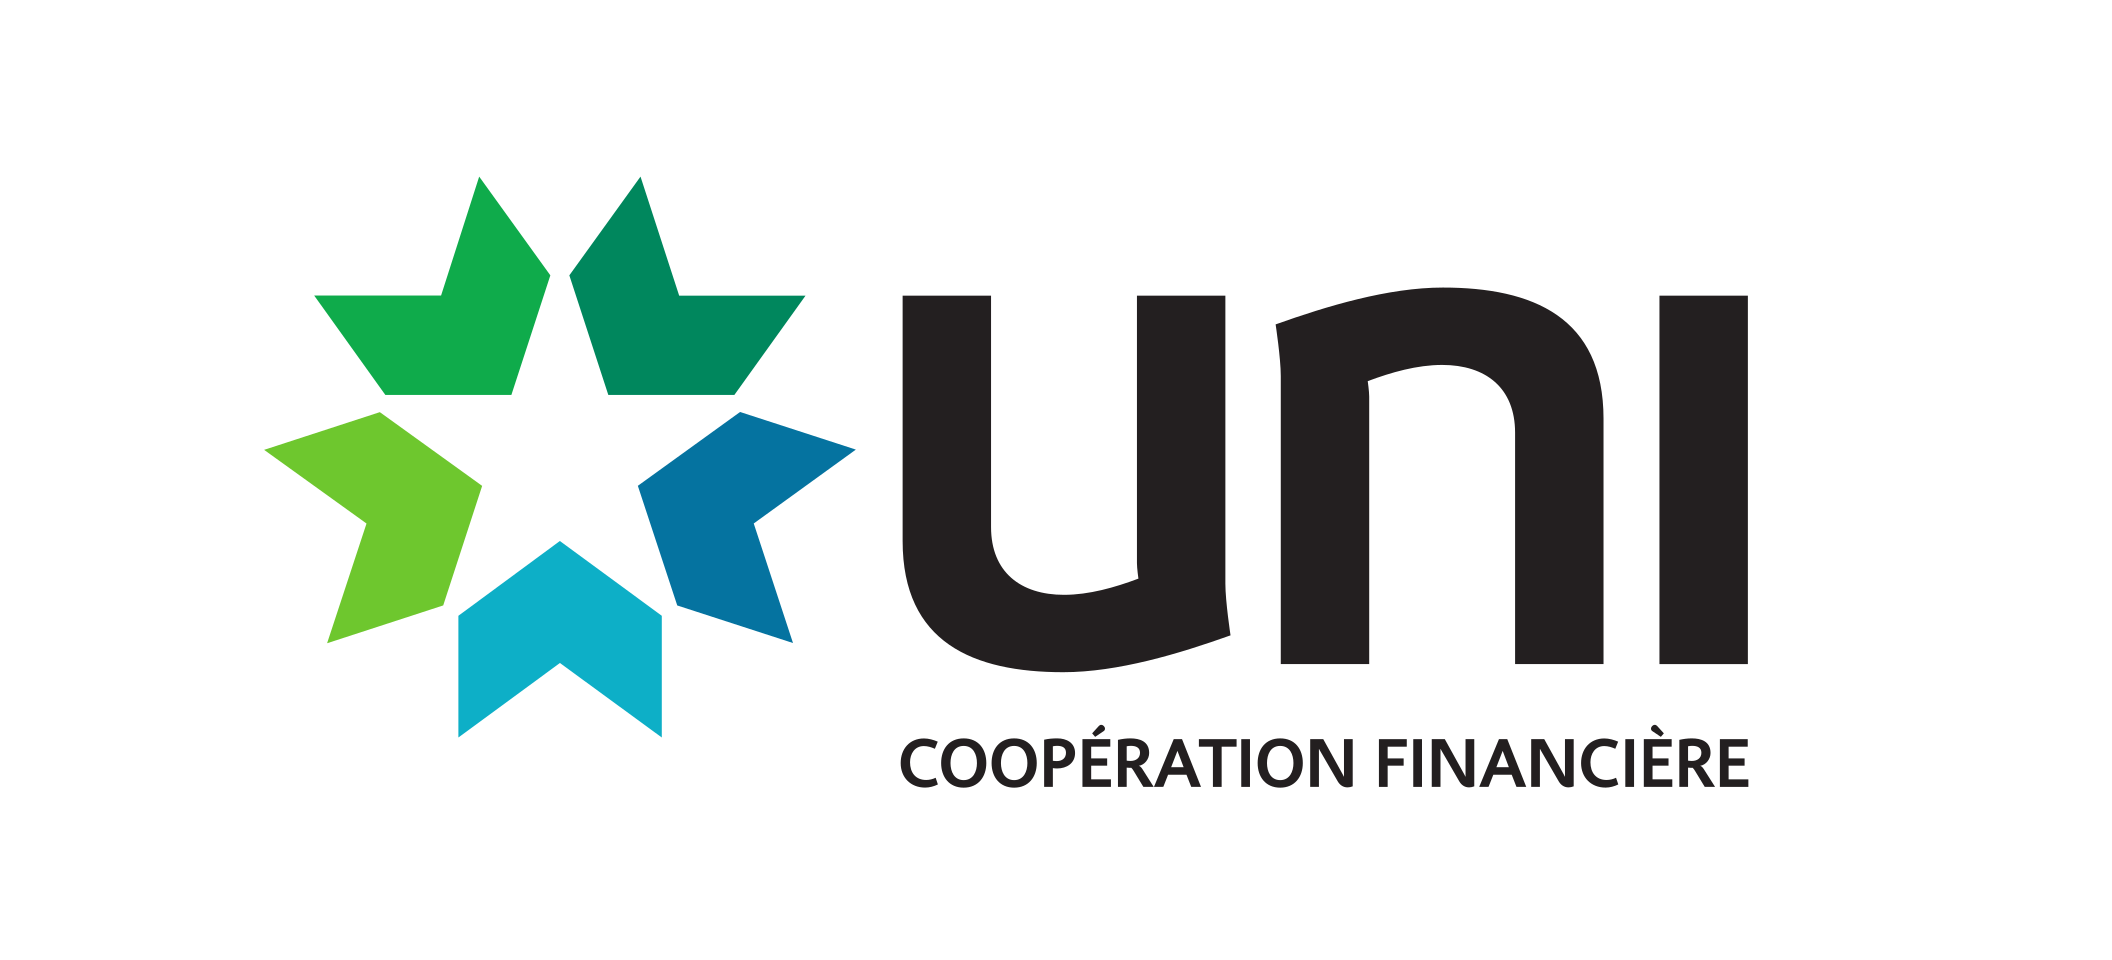 UNI-CooperationFinanciere